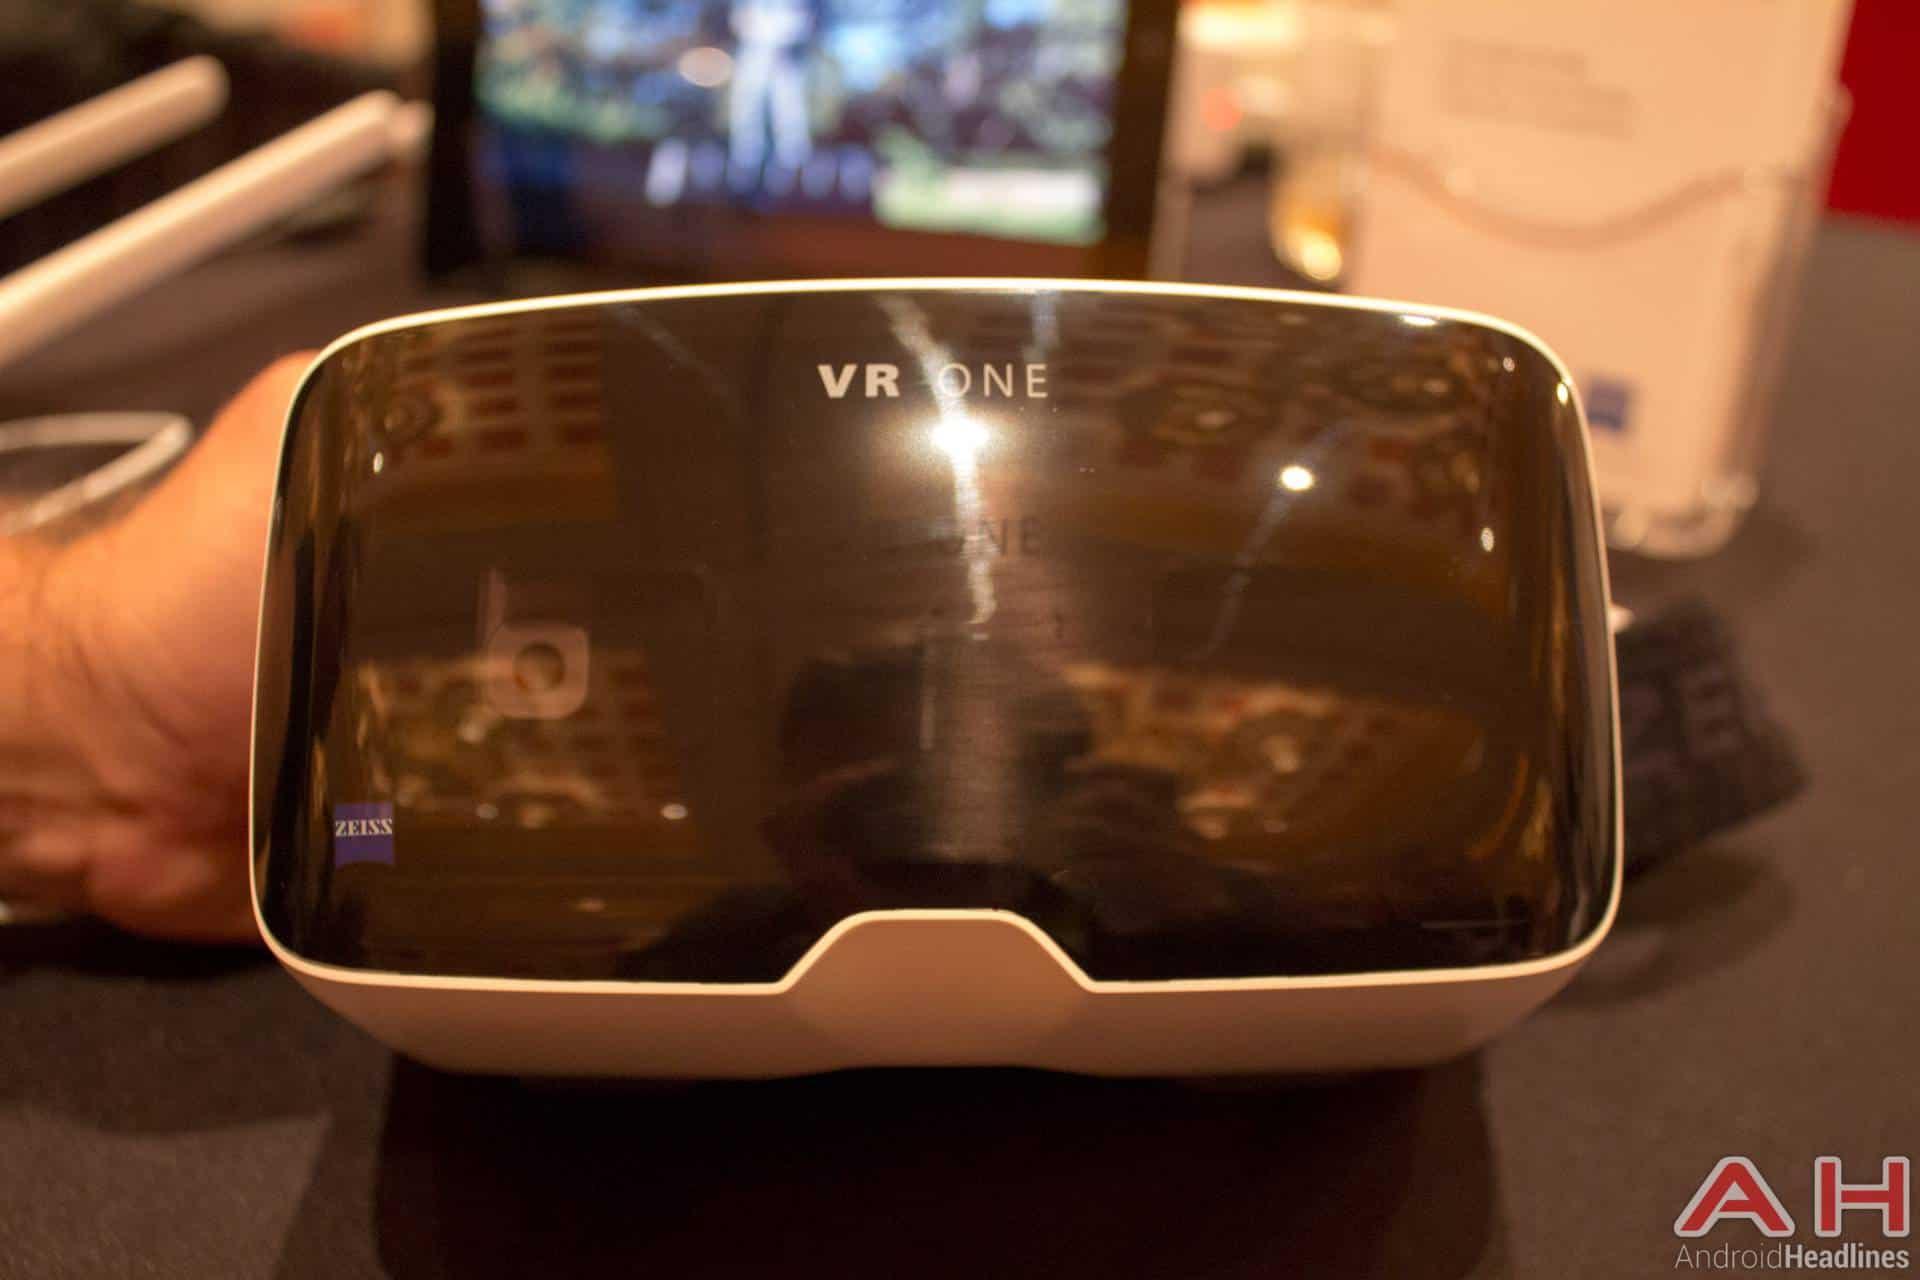 Carl Zeiss VR One AH 9